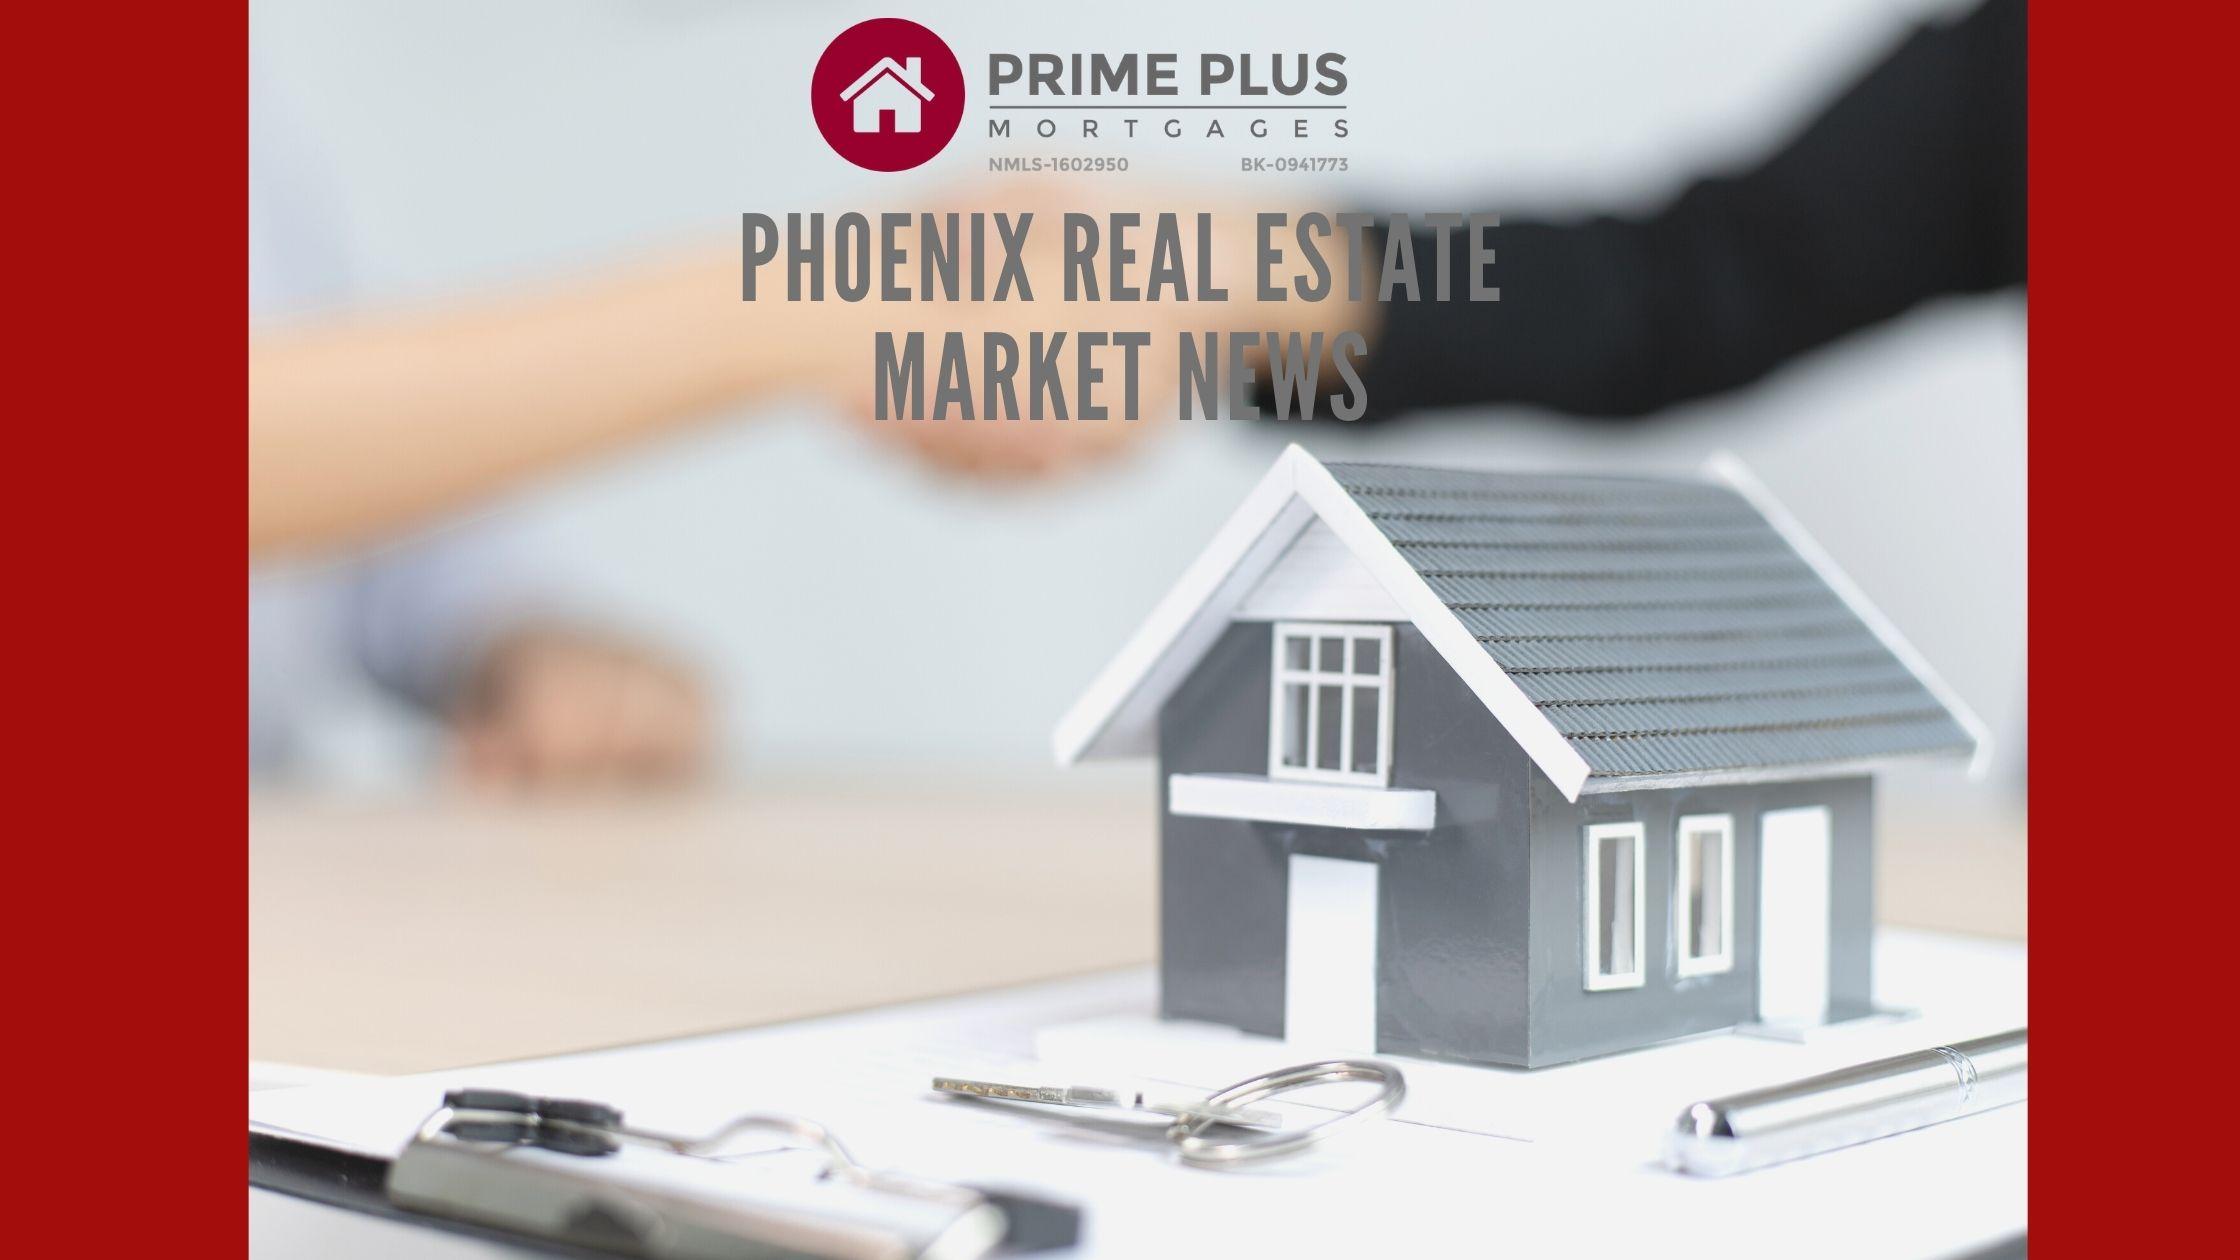 Phoenix Real Estate Market News